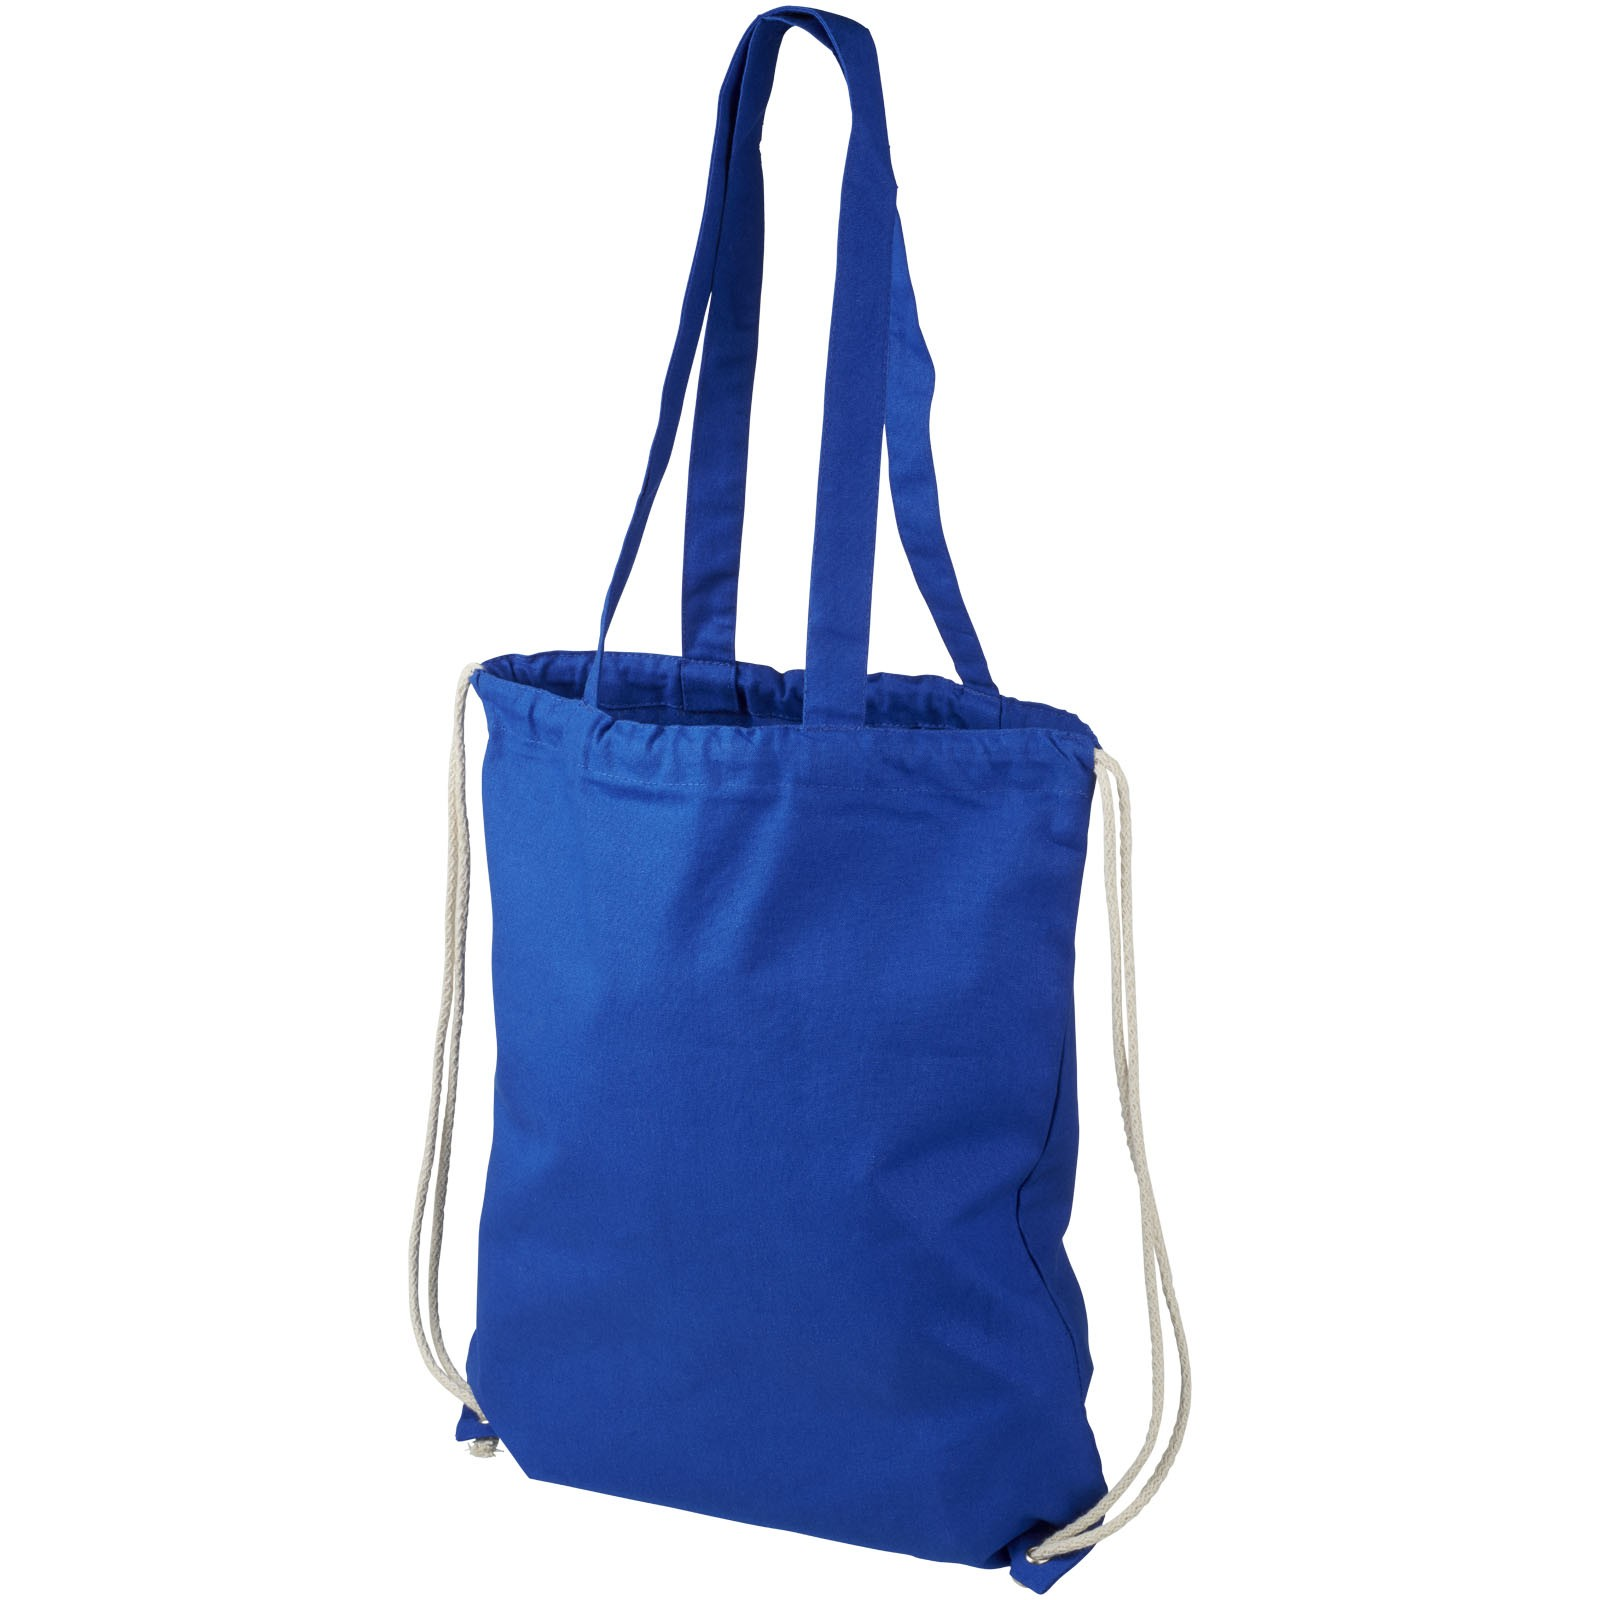 Eliza 240 g/m² cotton drawstring backpack - Royal blue